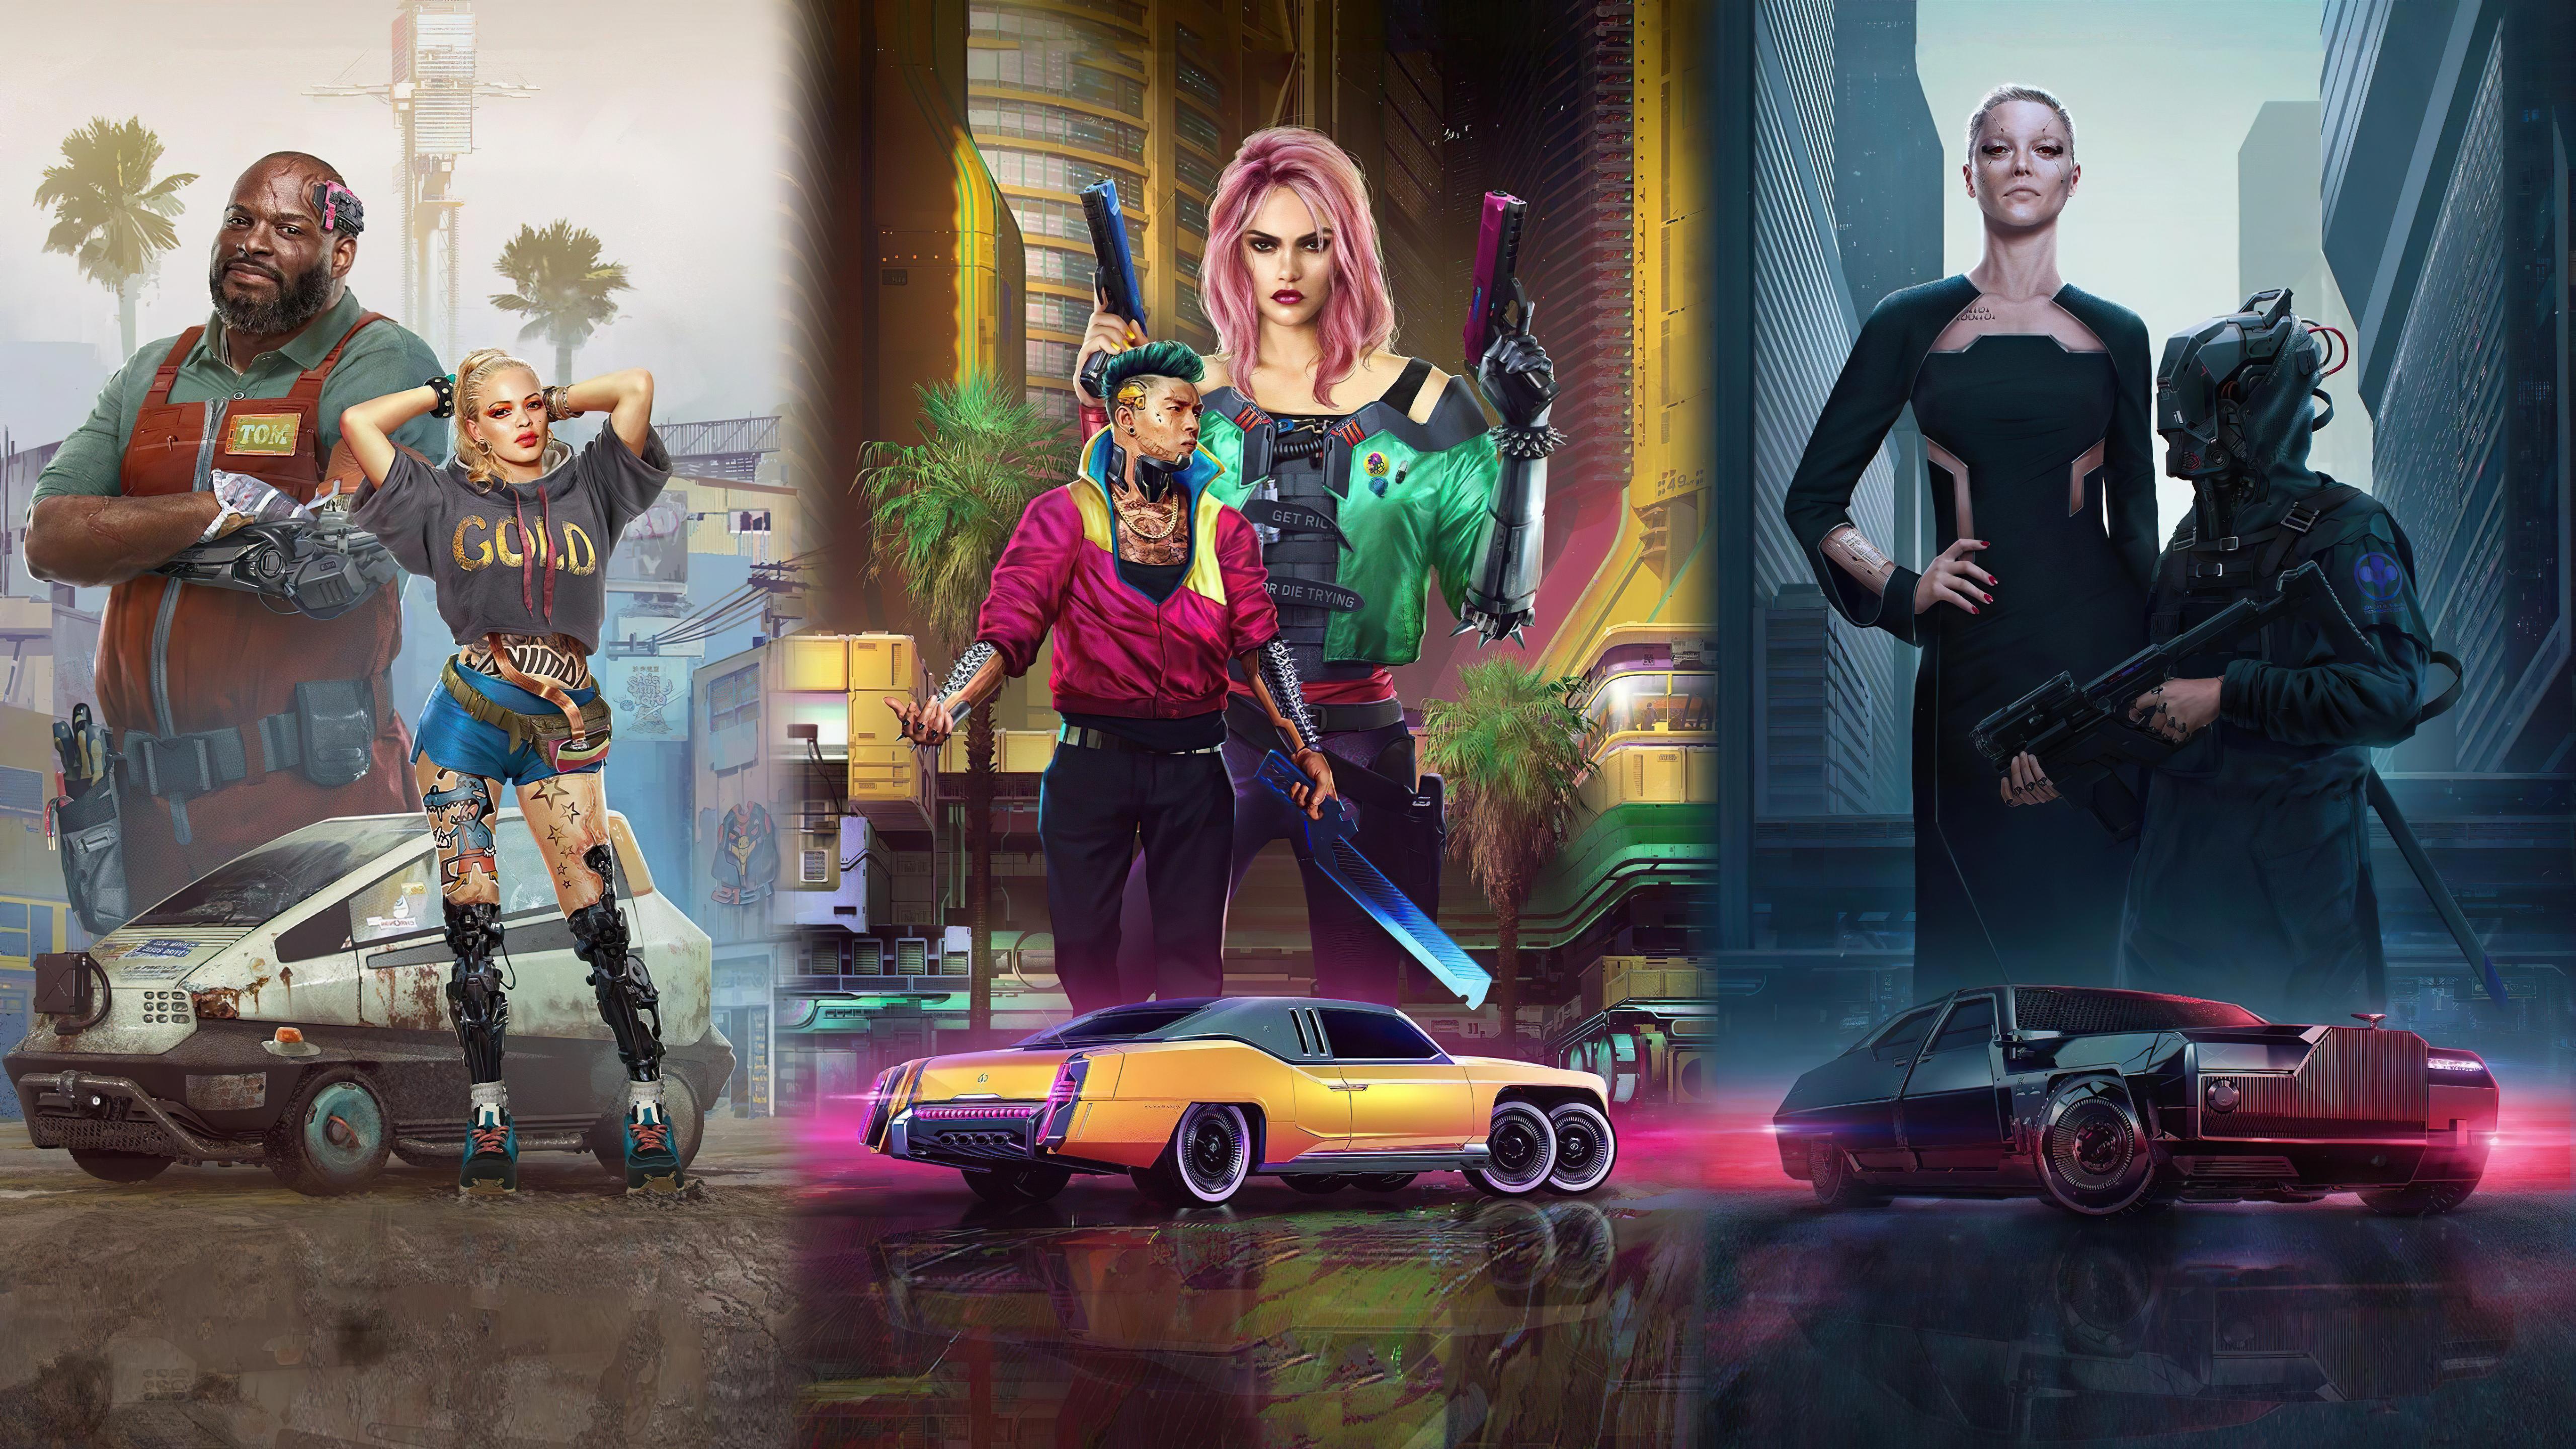 General 5120x2880 cyberpunk Cyberpunk 2077 4K science fiction